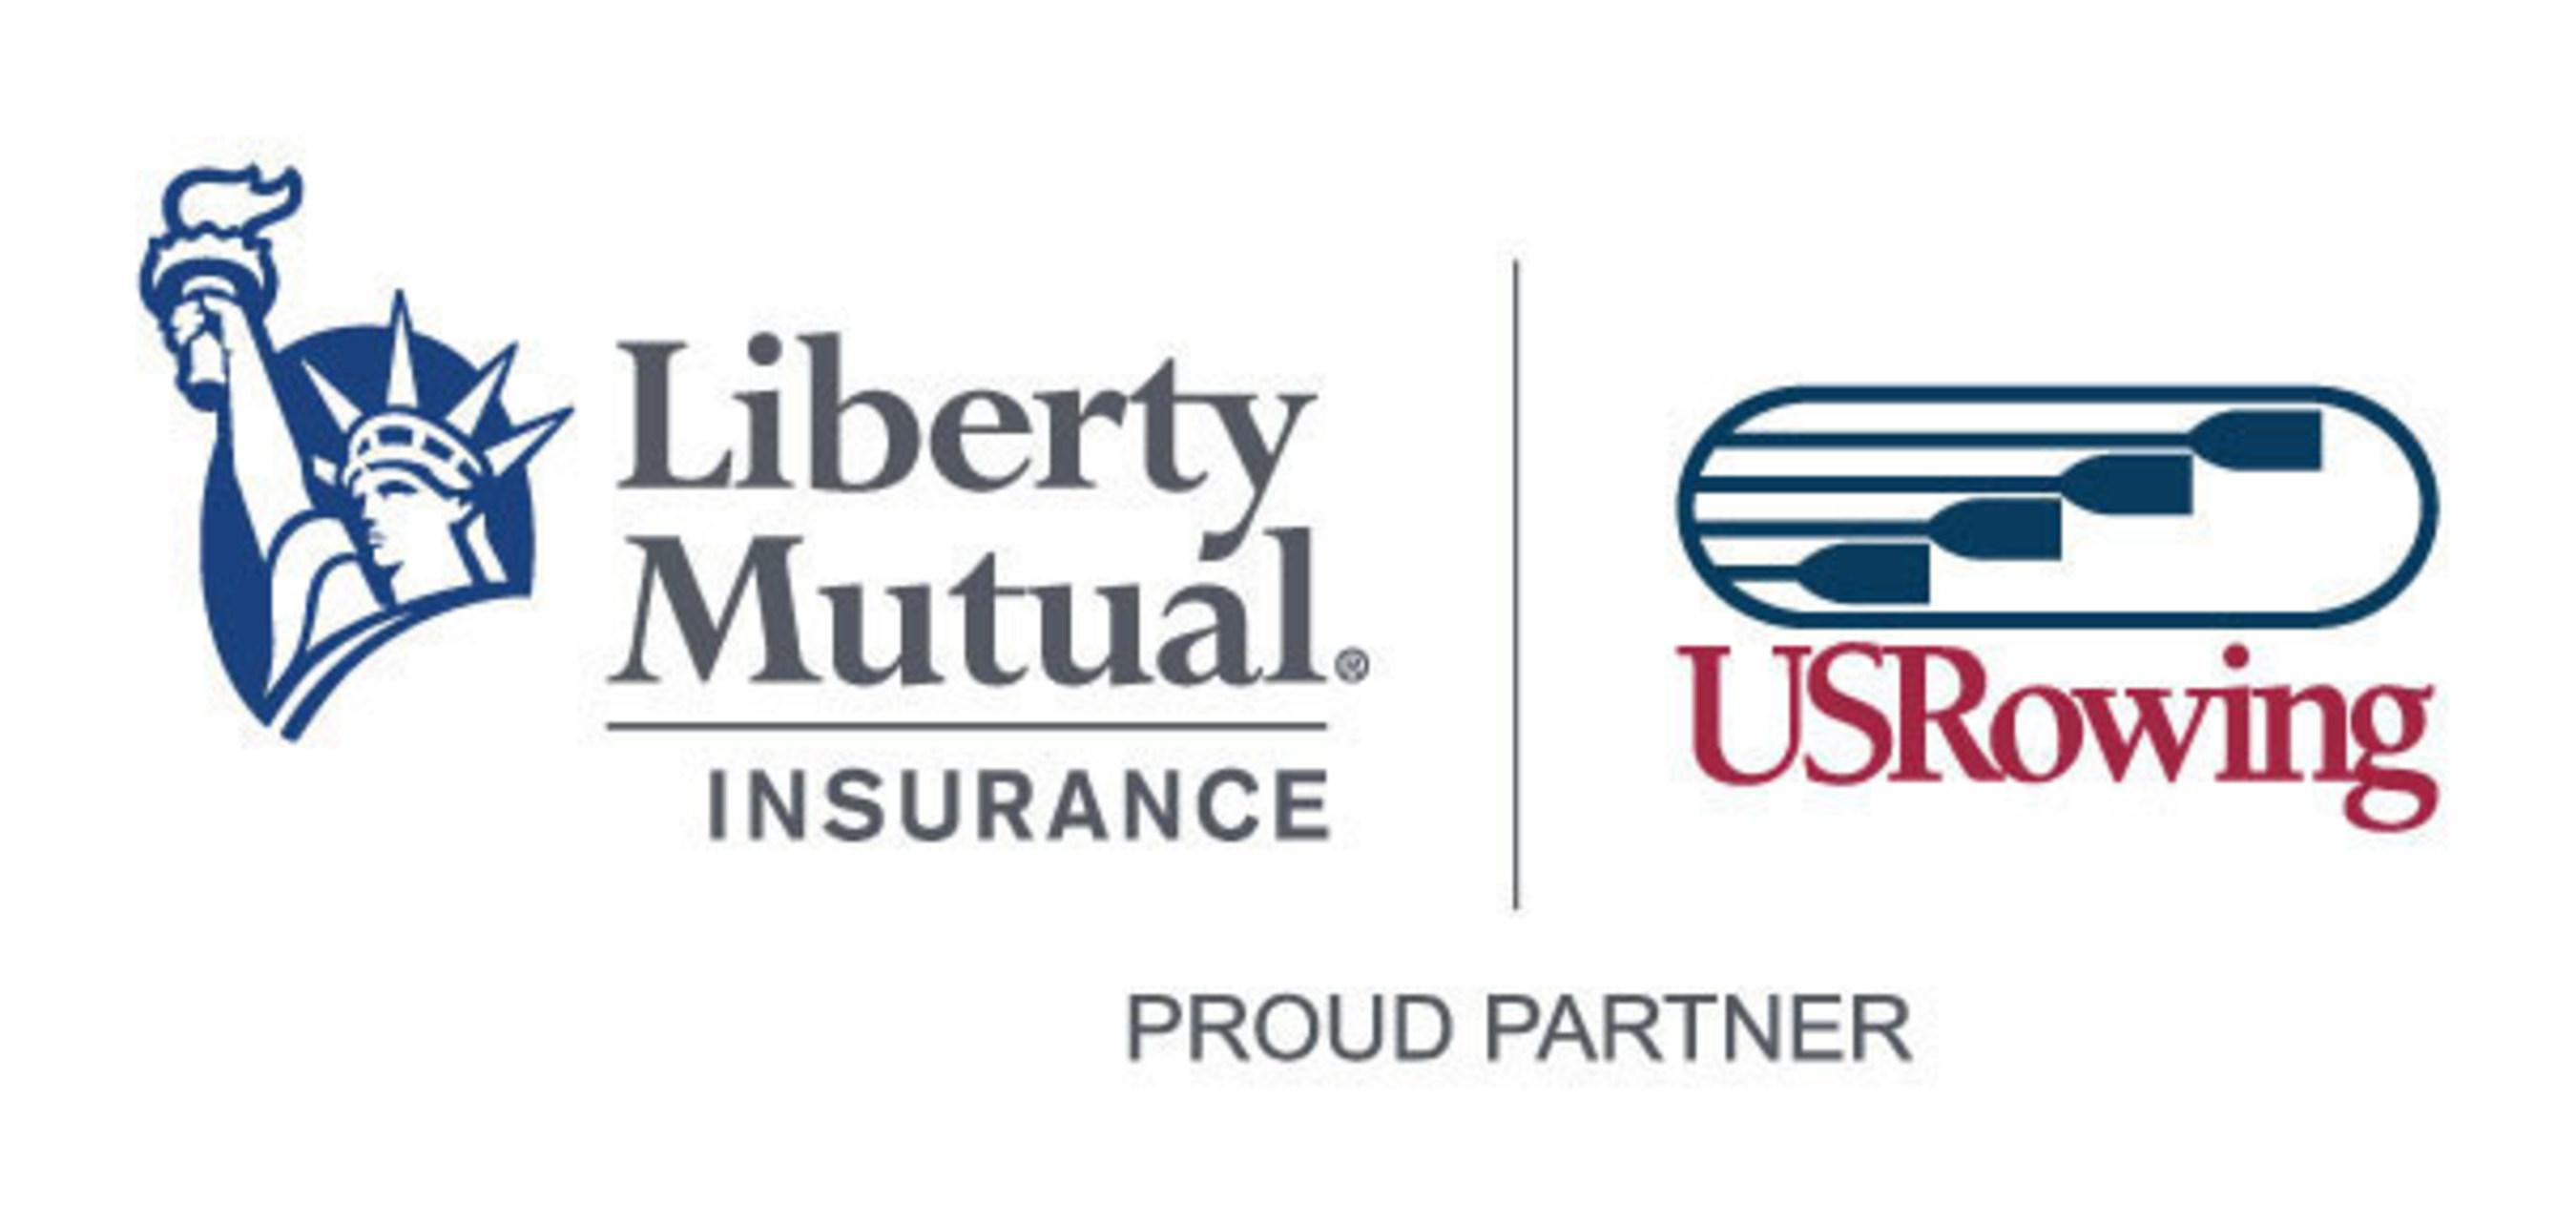 Liberty Mutual Com >> Liberty Mutual Insurance Named Gold Medal Sponsor Of Usrowing